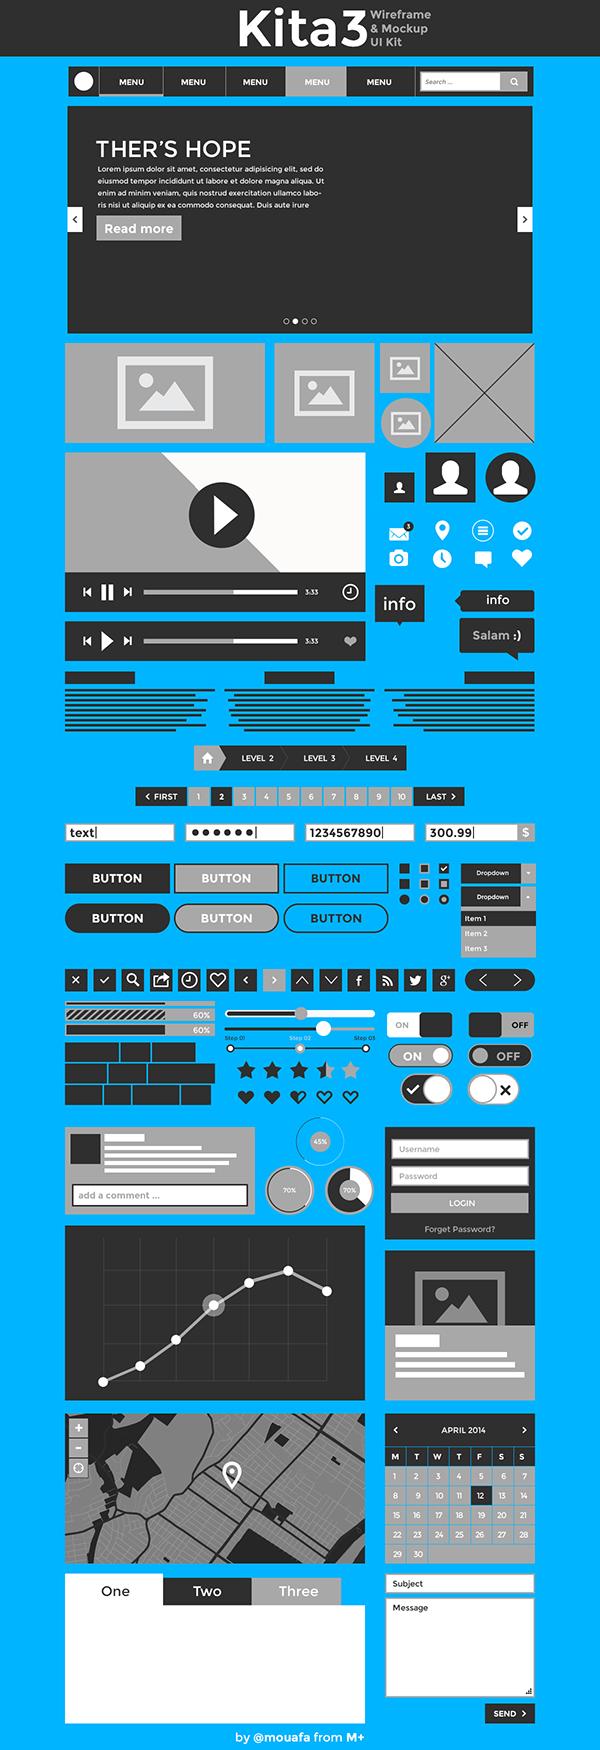 free kita3 UI wireframe Mockup psd download freebie freebies Web design ux